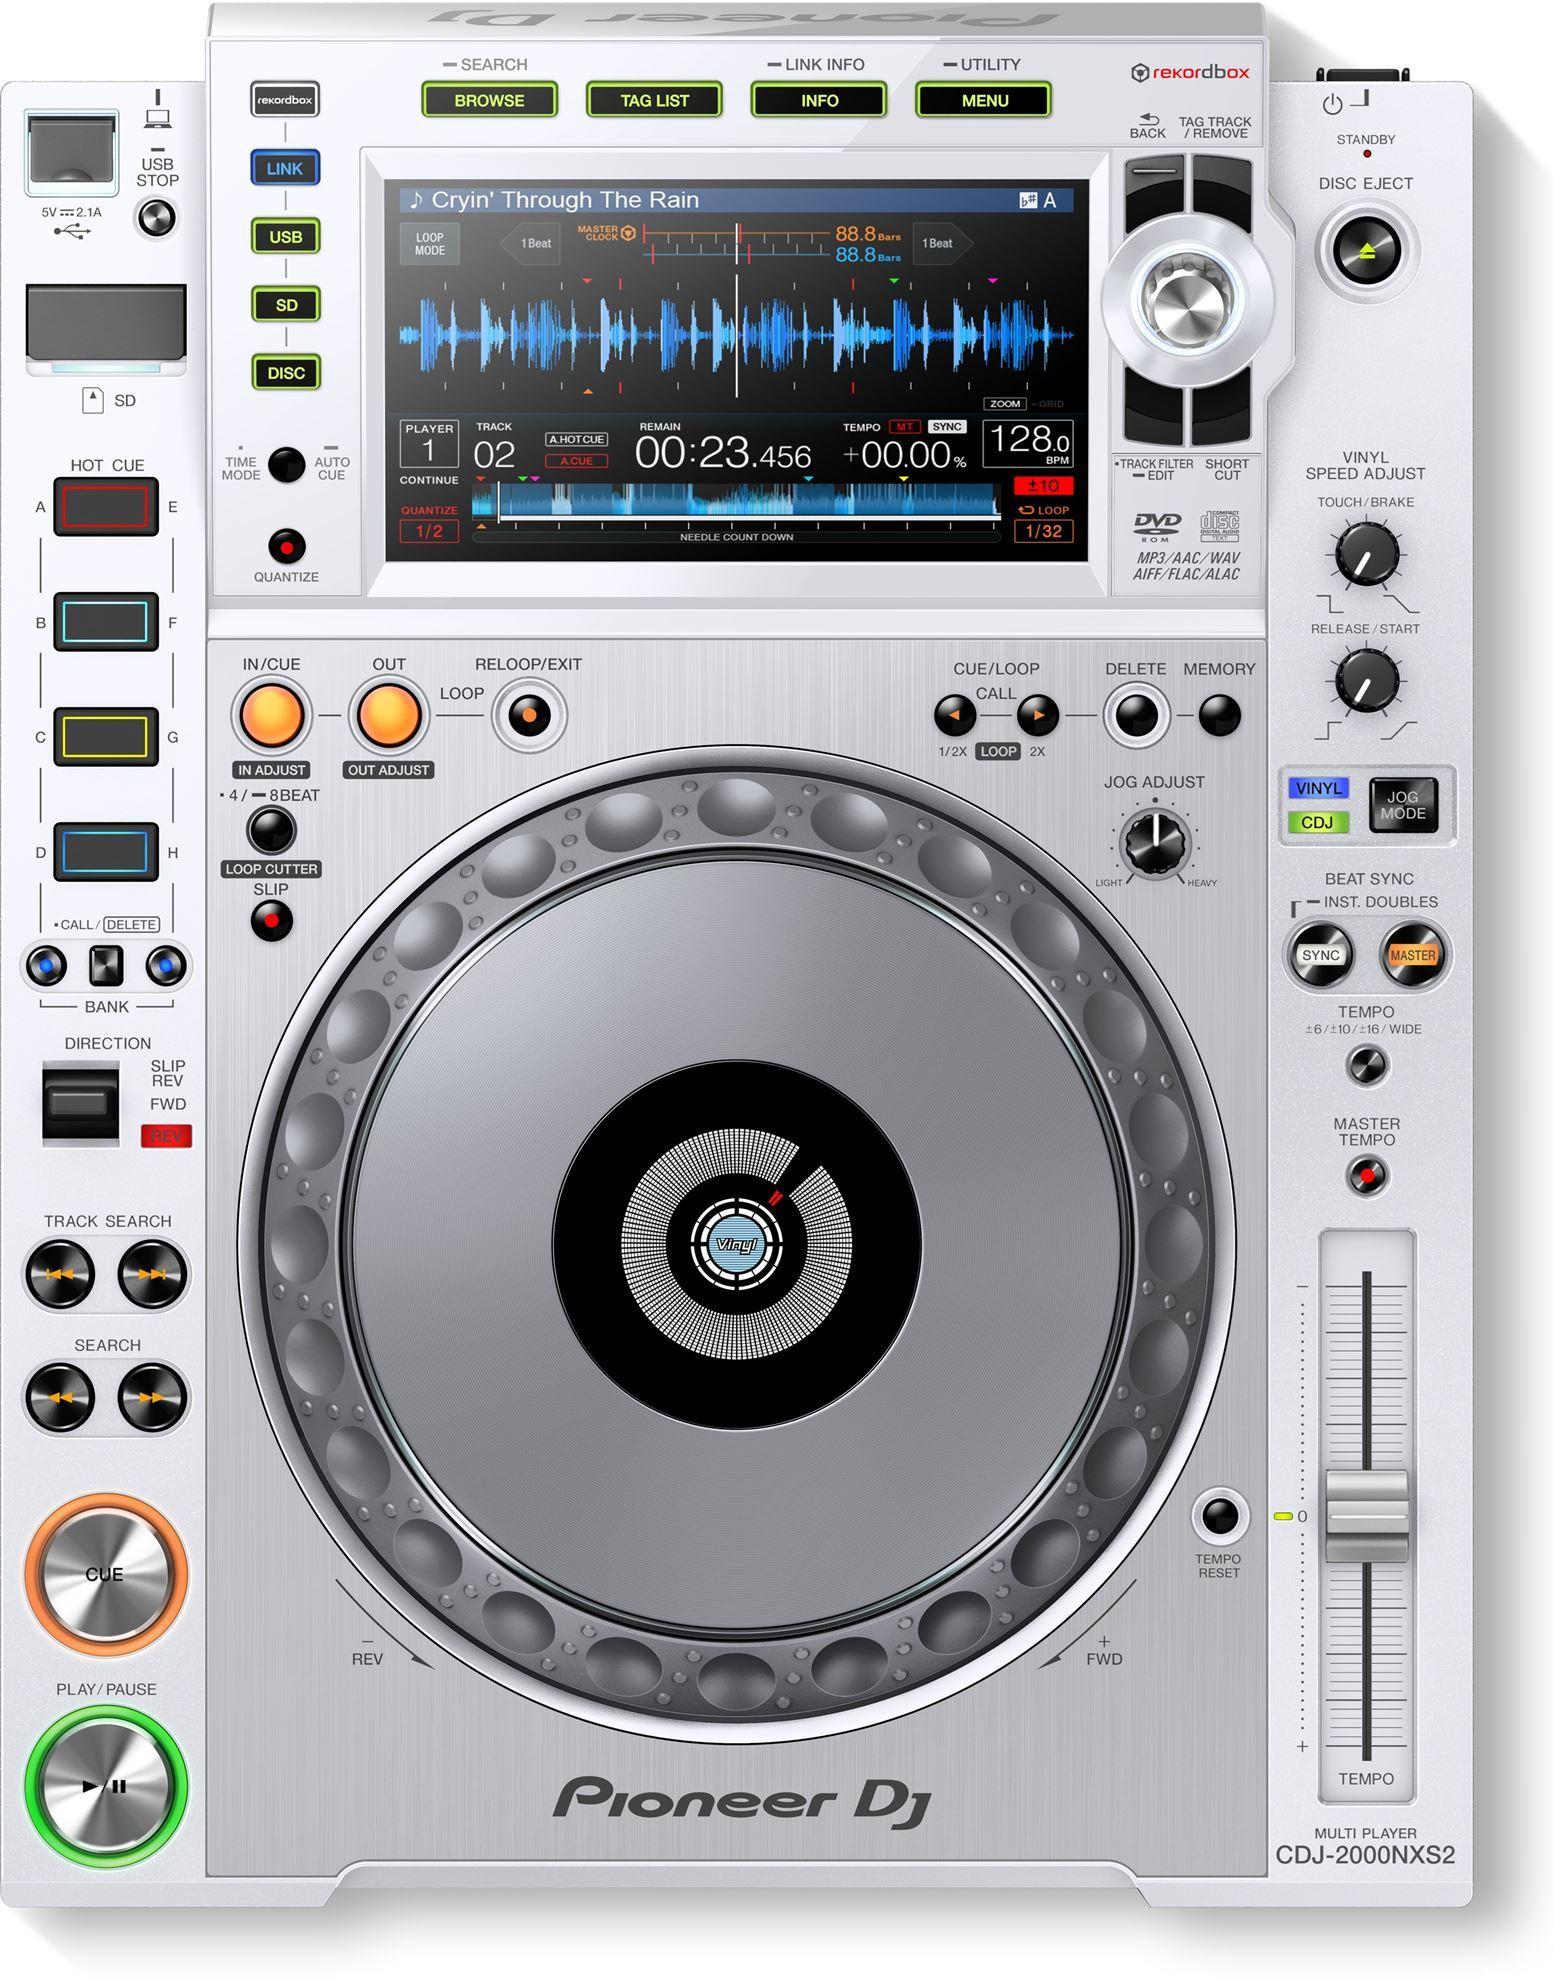 0106323 pioneer dj cdj 2000nxs2 w  1544712799 152 acda6e2a025